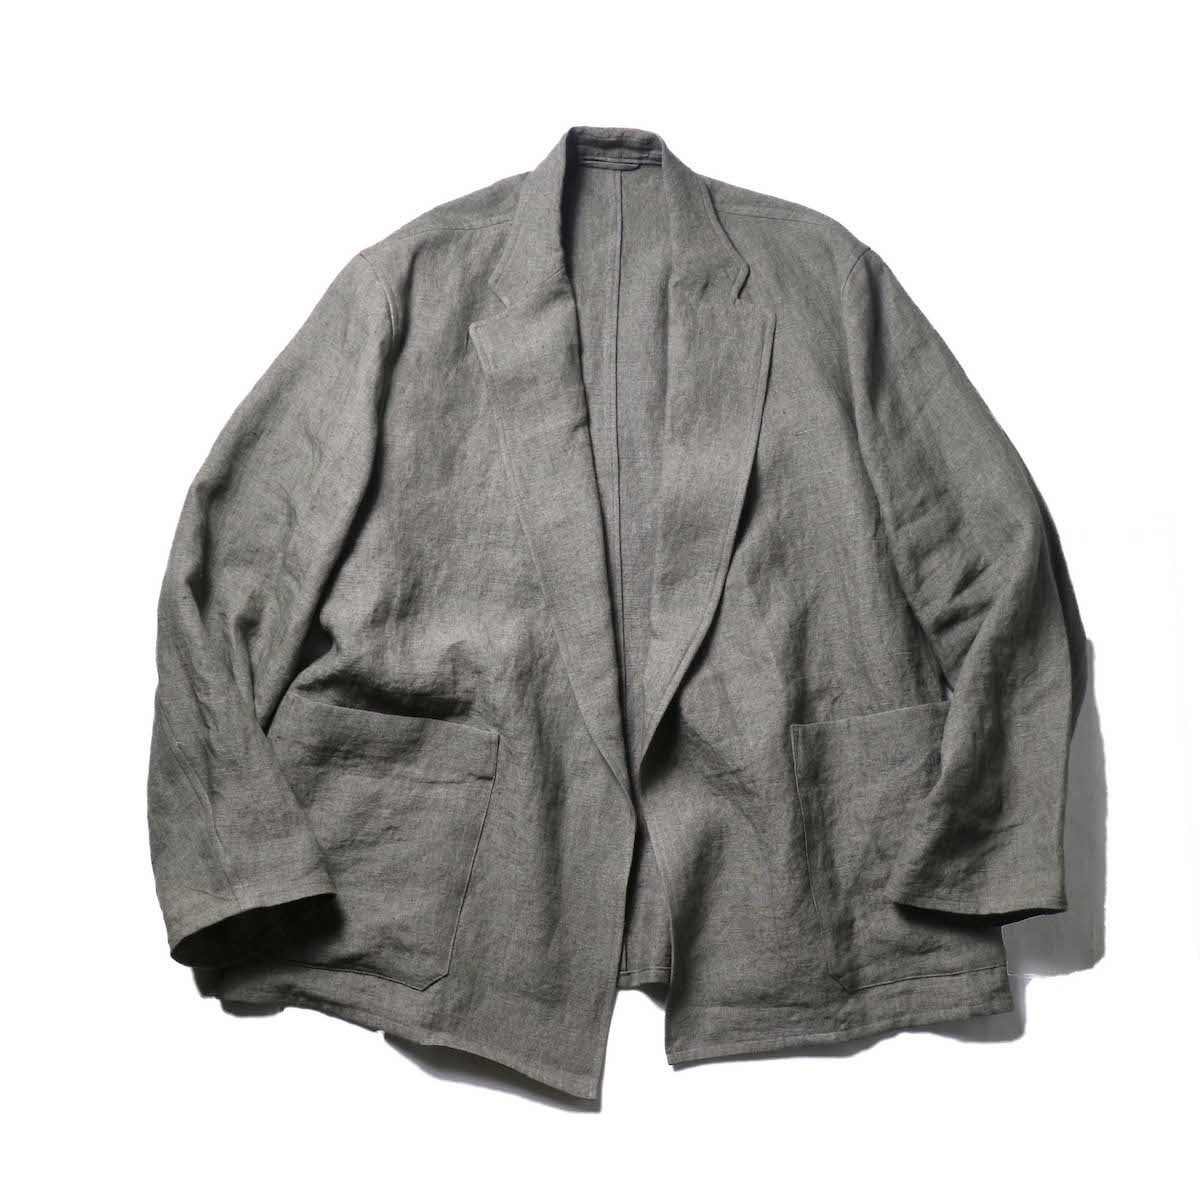 blurhms / Wash Linen Cardigan Jacket (KhakiGrey)正面